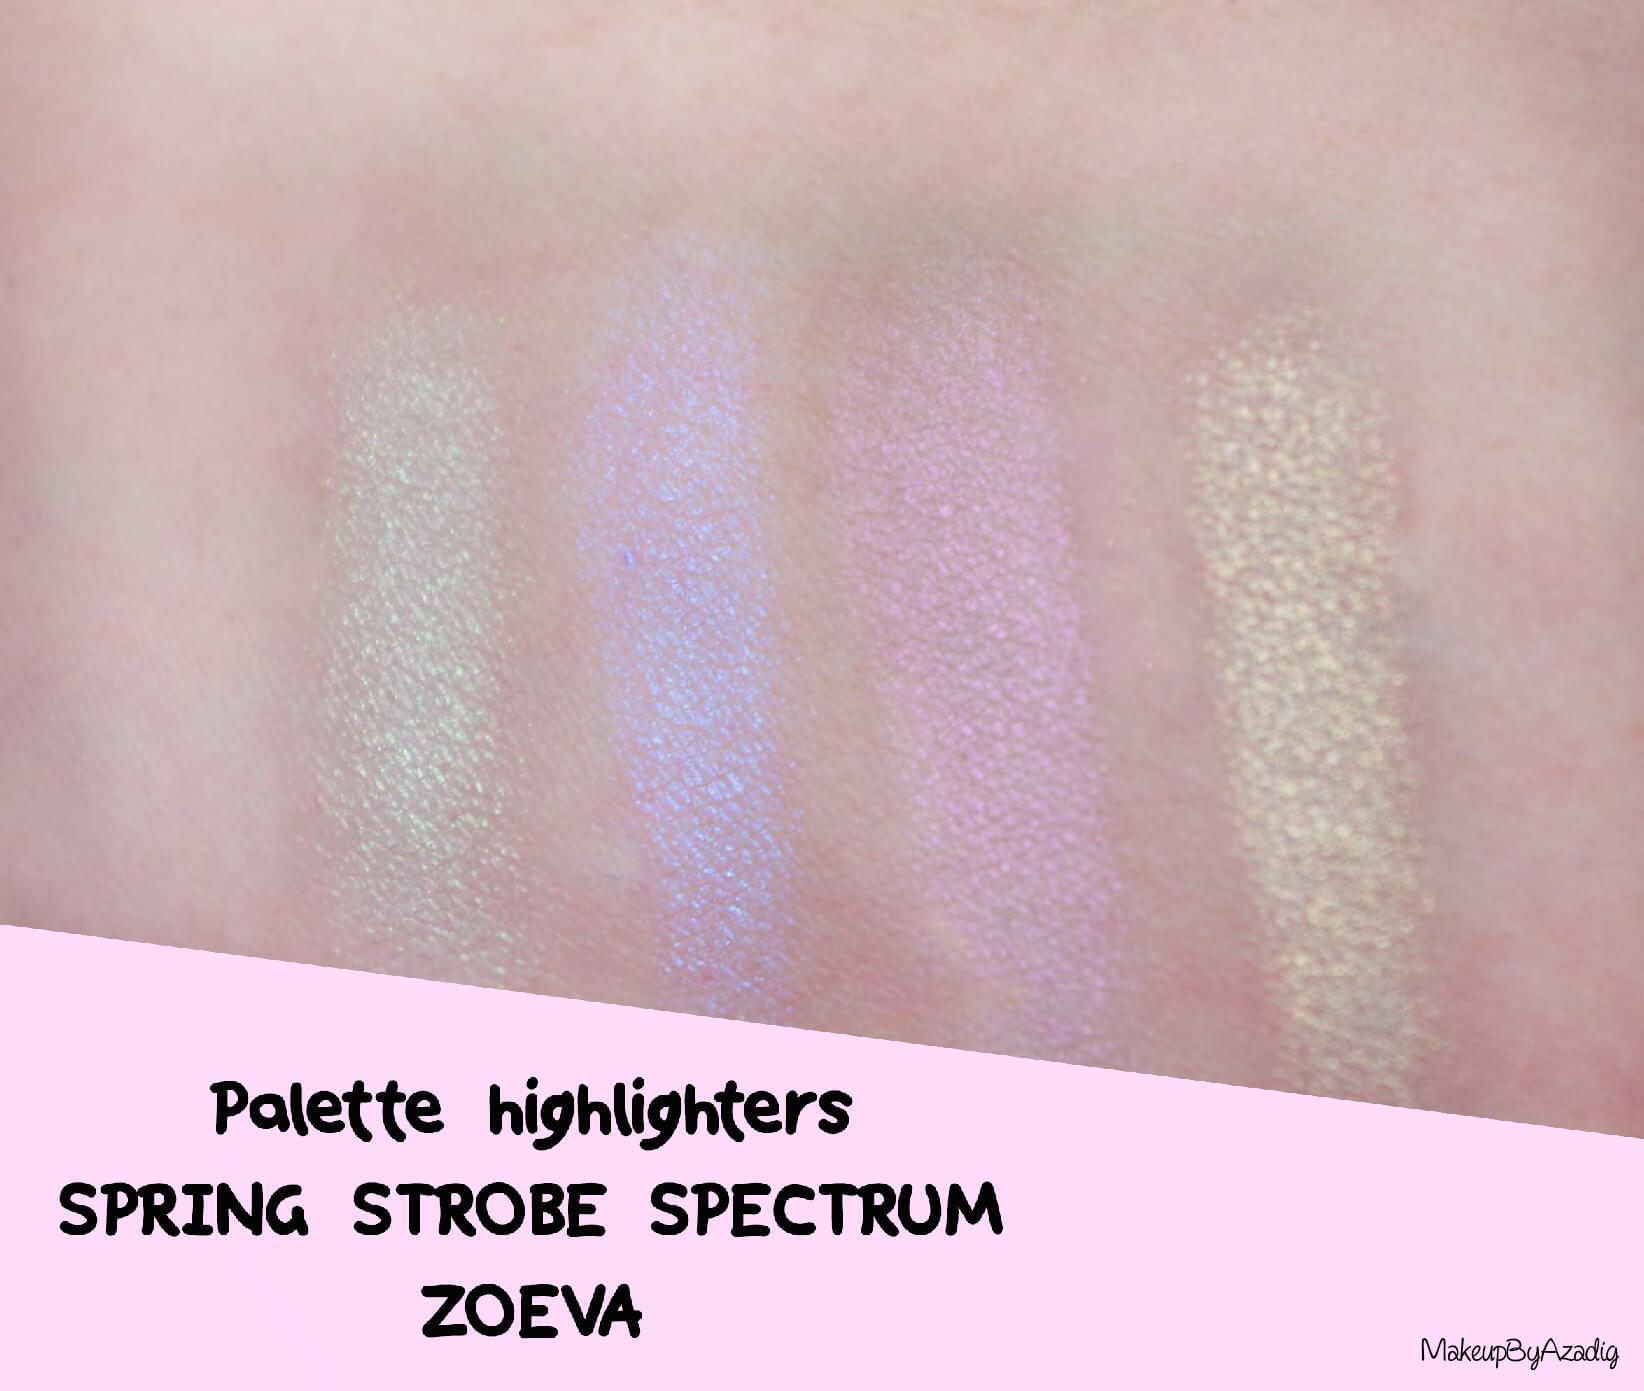 palette-highlighter-enlumineur-pas-cher-spring-strobe-spectrum-zoeva-sephora-arcenciel-licorne-makeupbyazadig-revue-avis-prix-swatches